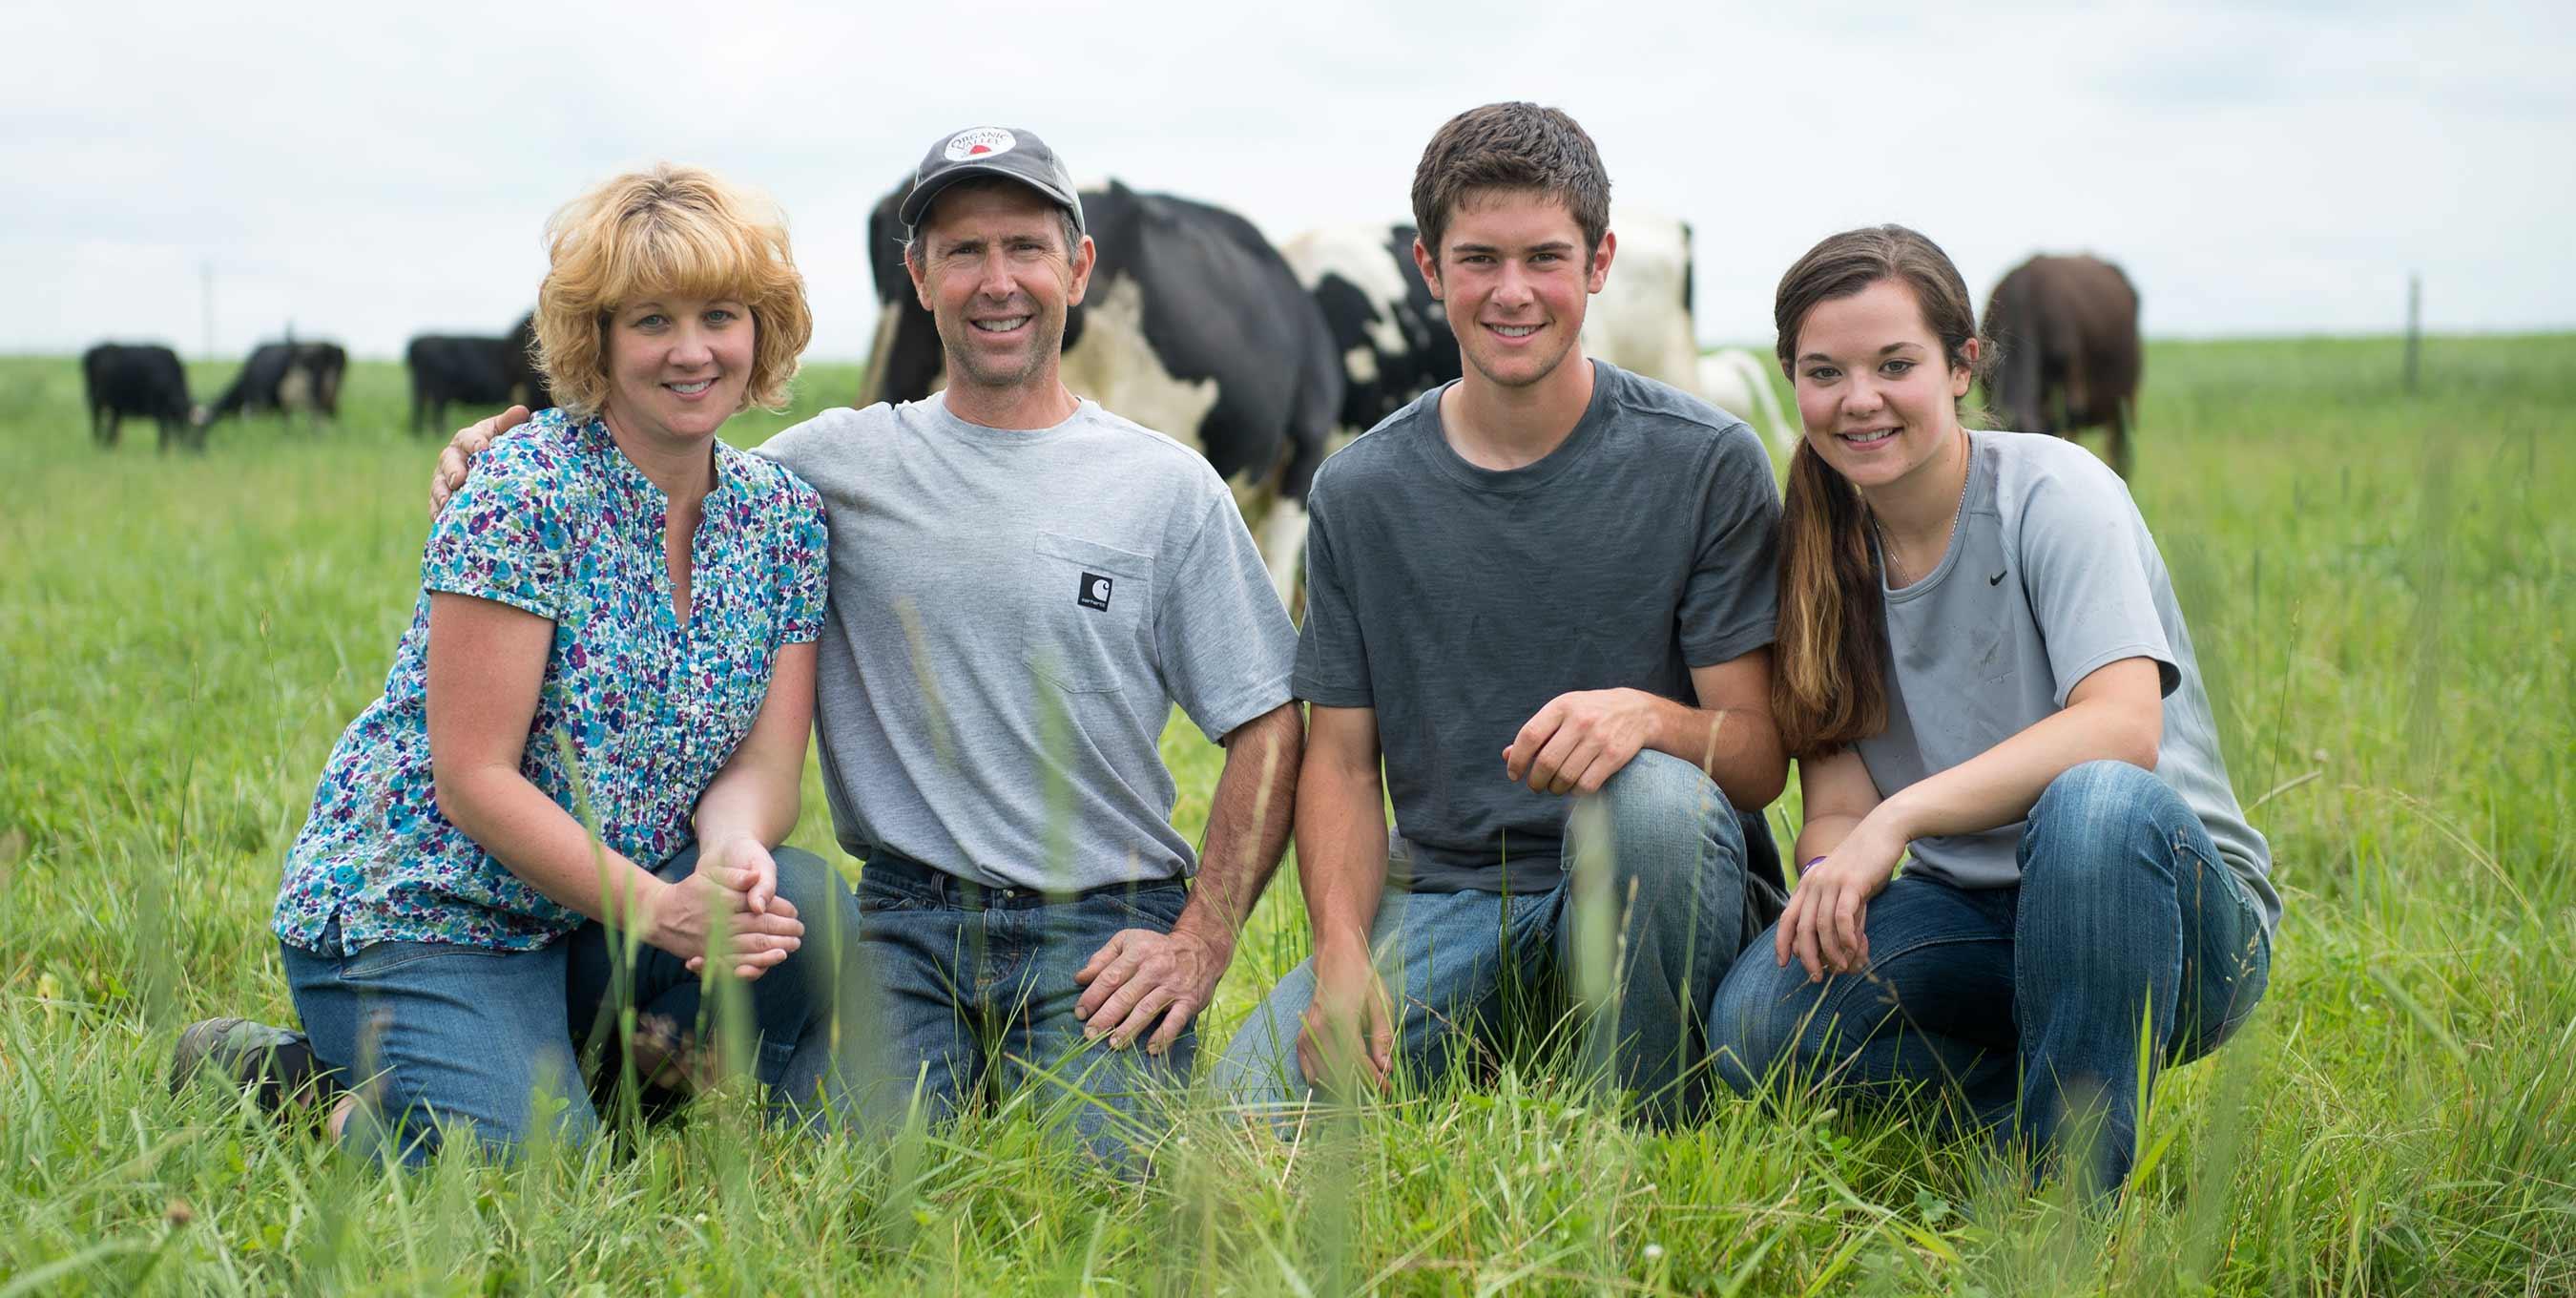 Choiniere Family Farm